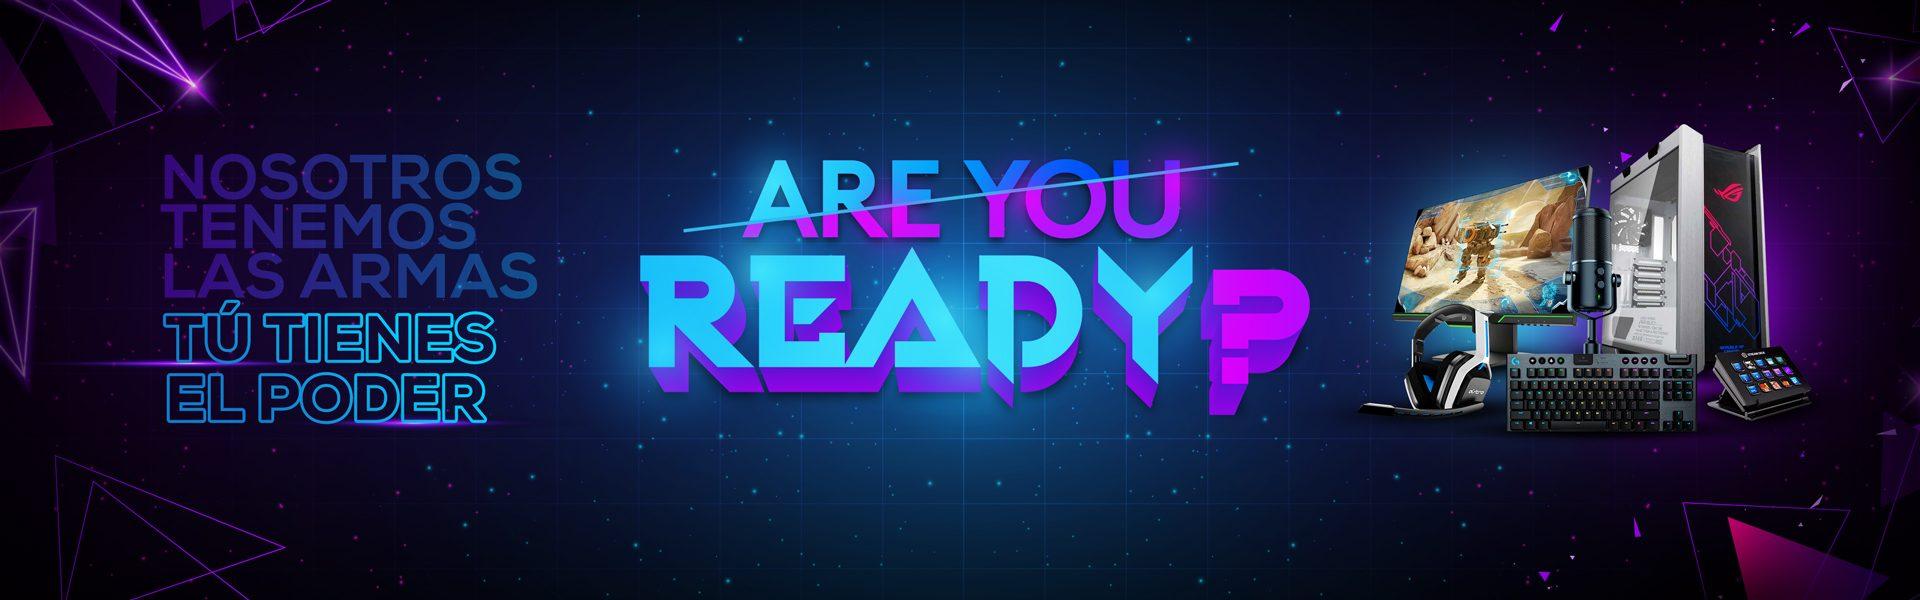 Banner-Are-yo-ready